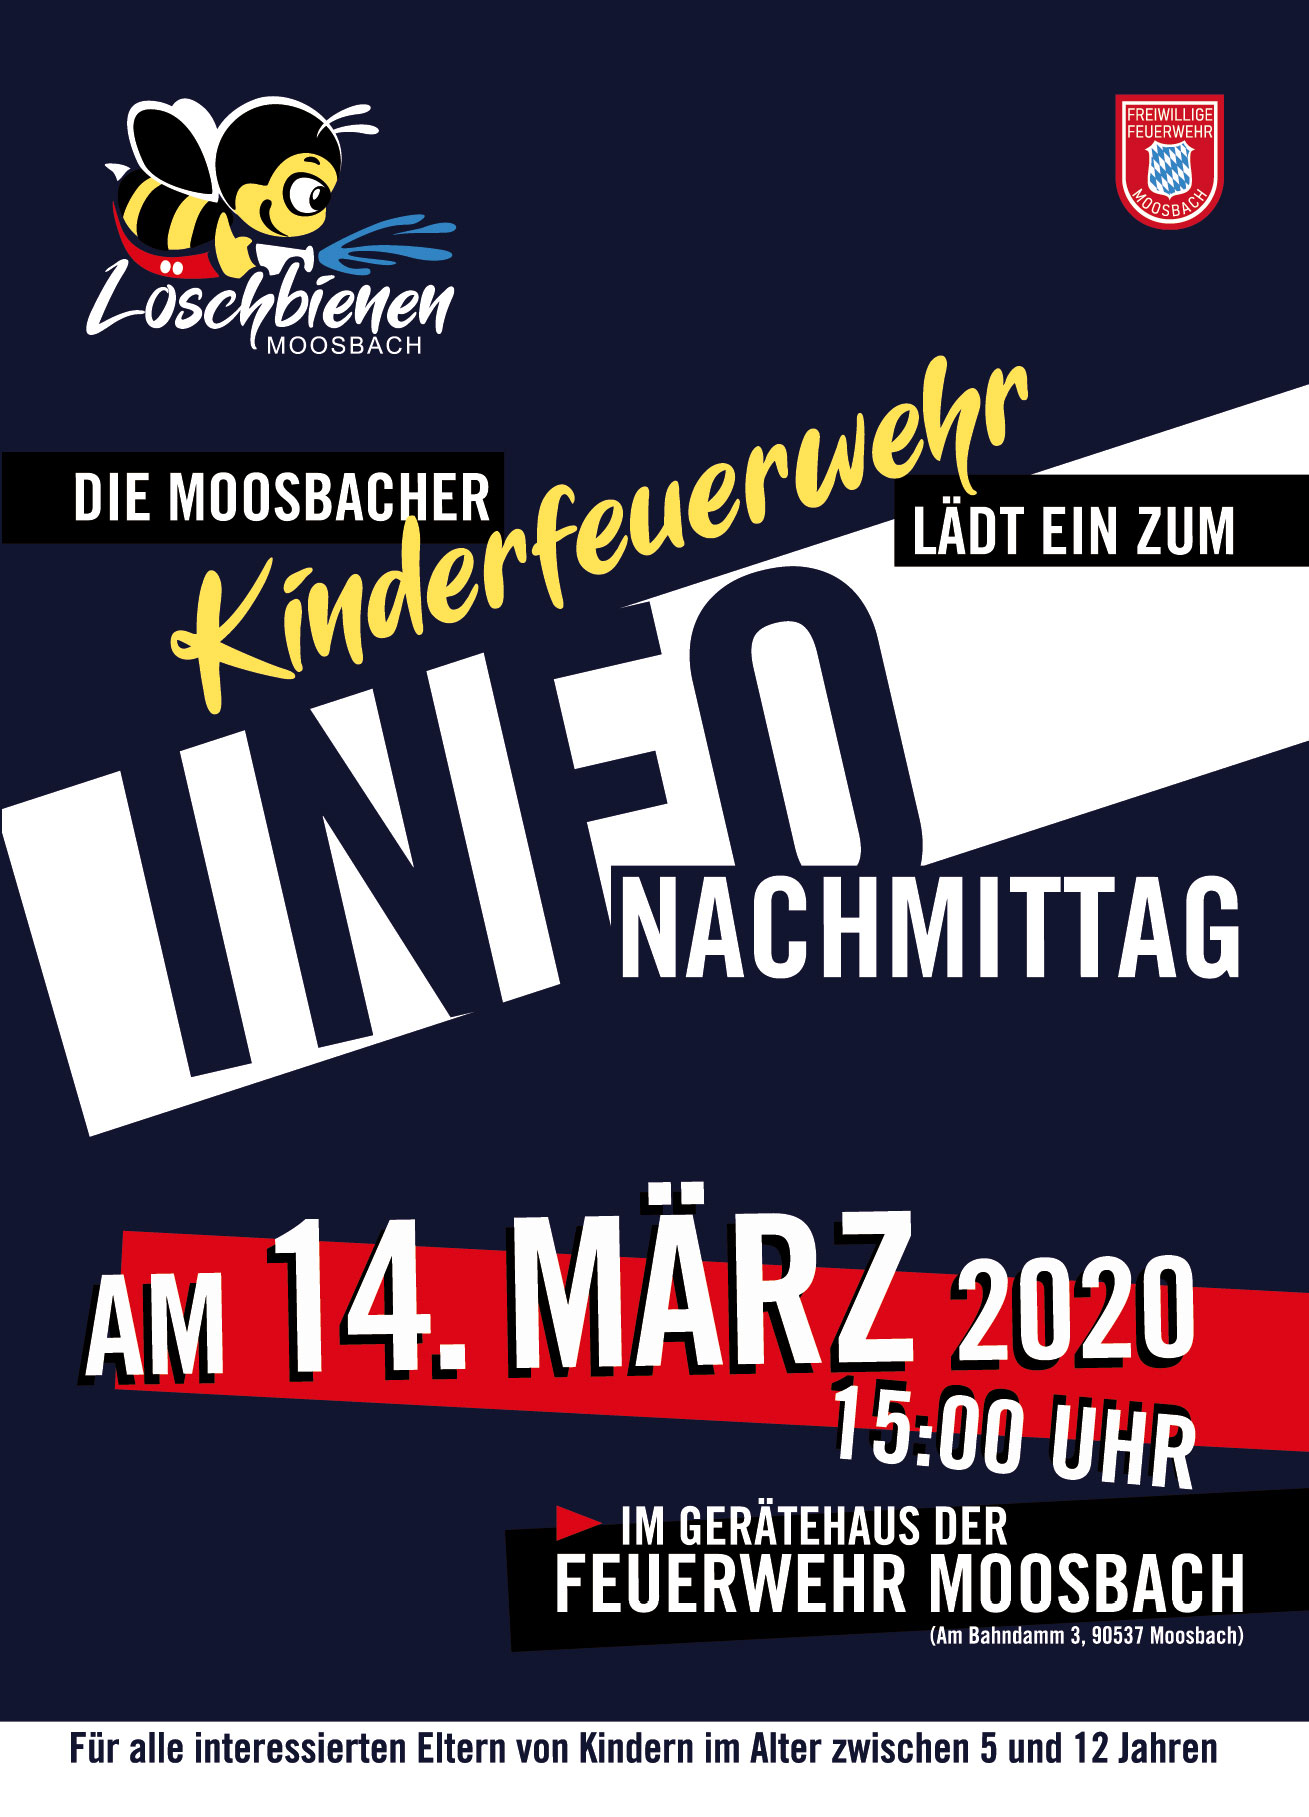 Infonachmittag_Kinderfeuerwehr_Moosbach